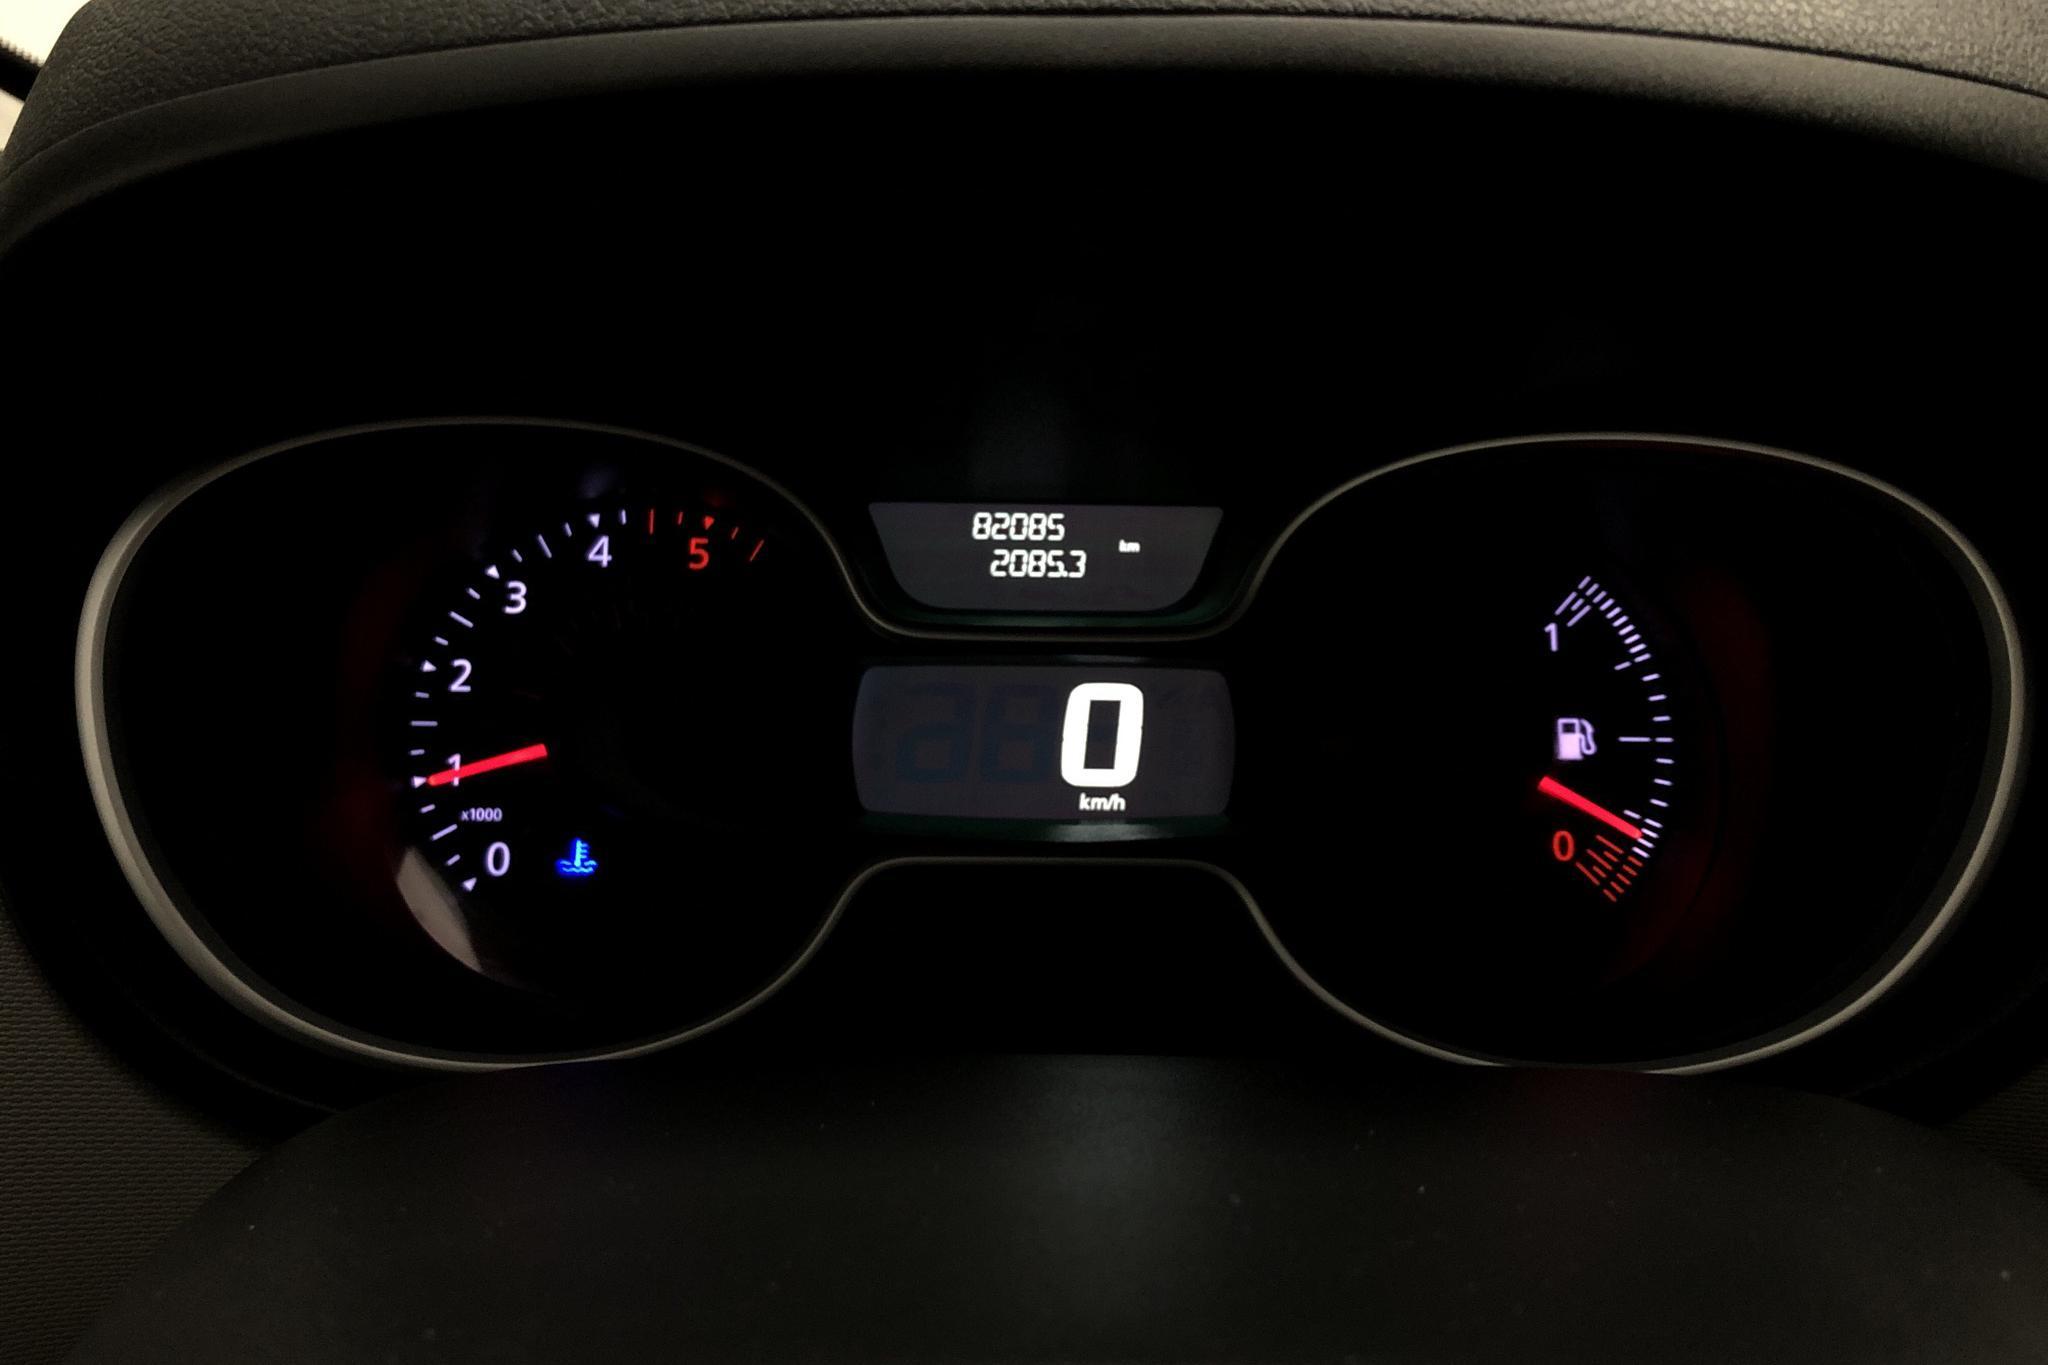 Nissan NV300 1.6 dCi (120hk) - 8 208 mil - Manuell - röd - 2017